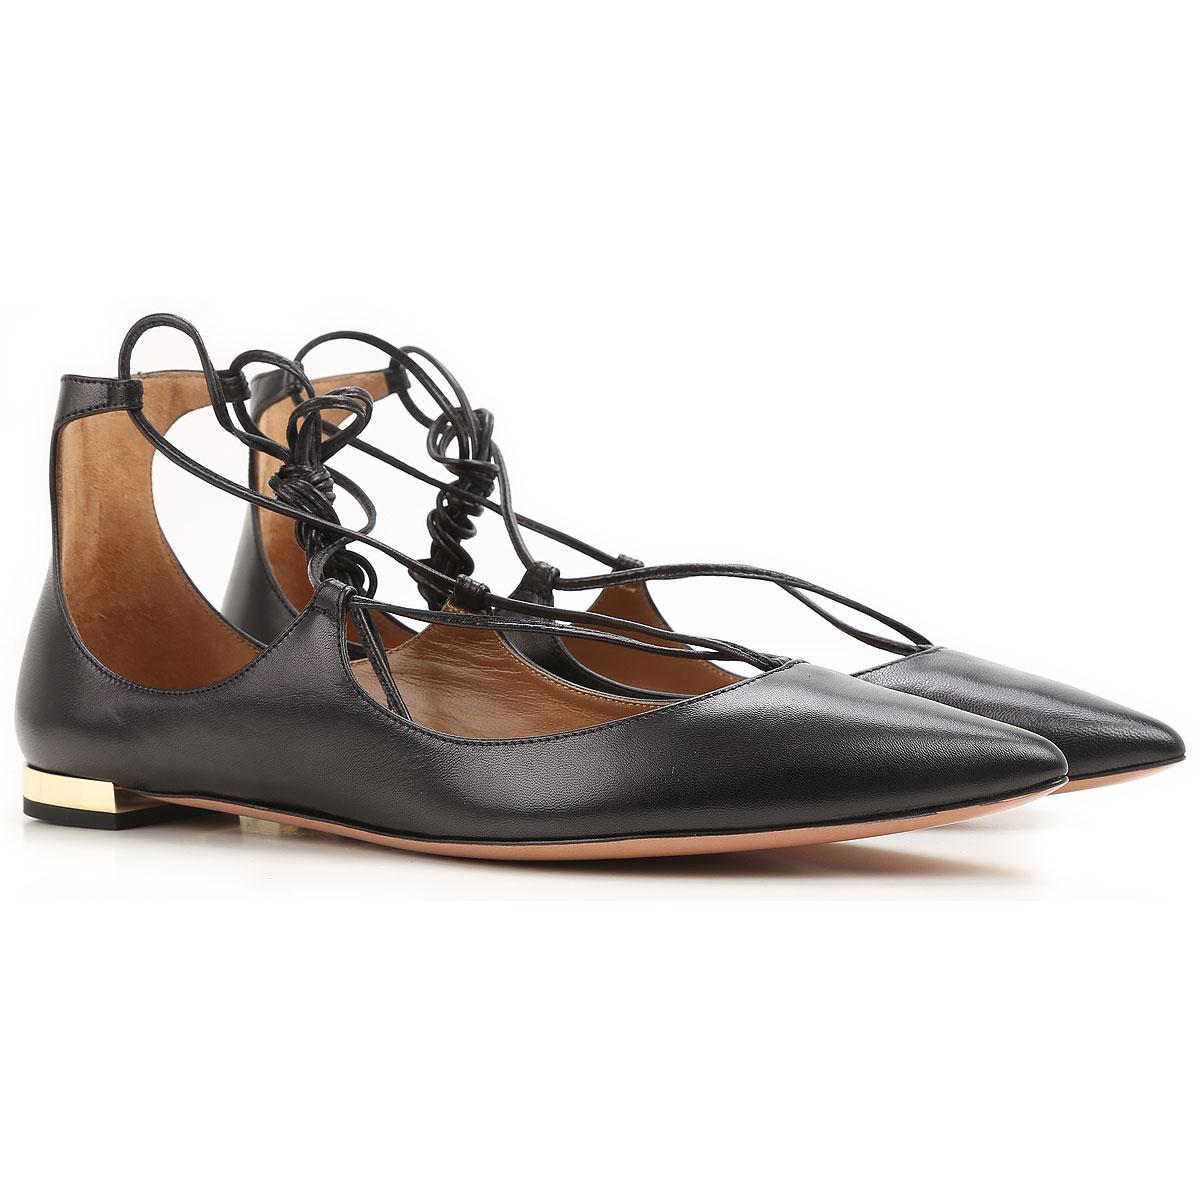 Image of Aquazzura Ballet Flats Ballerina Shoes for Women On Sale, Black, Leather, 2017, 10 10.5 11 6 6.5 7 8.5 9 9.5